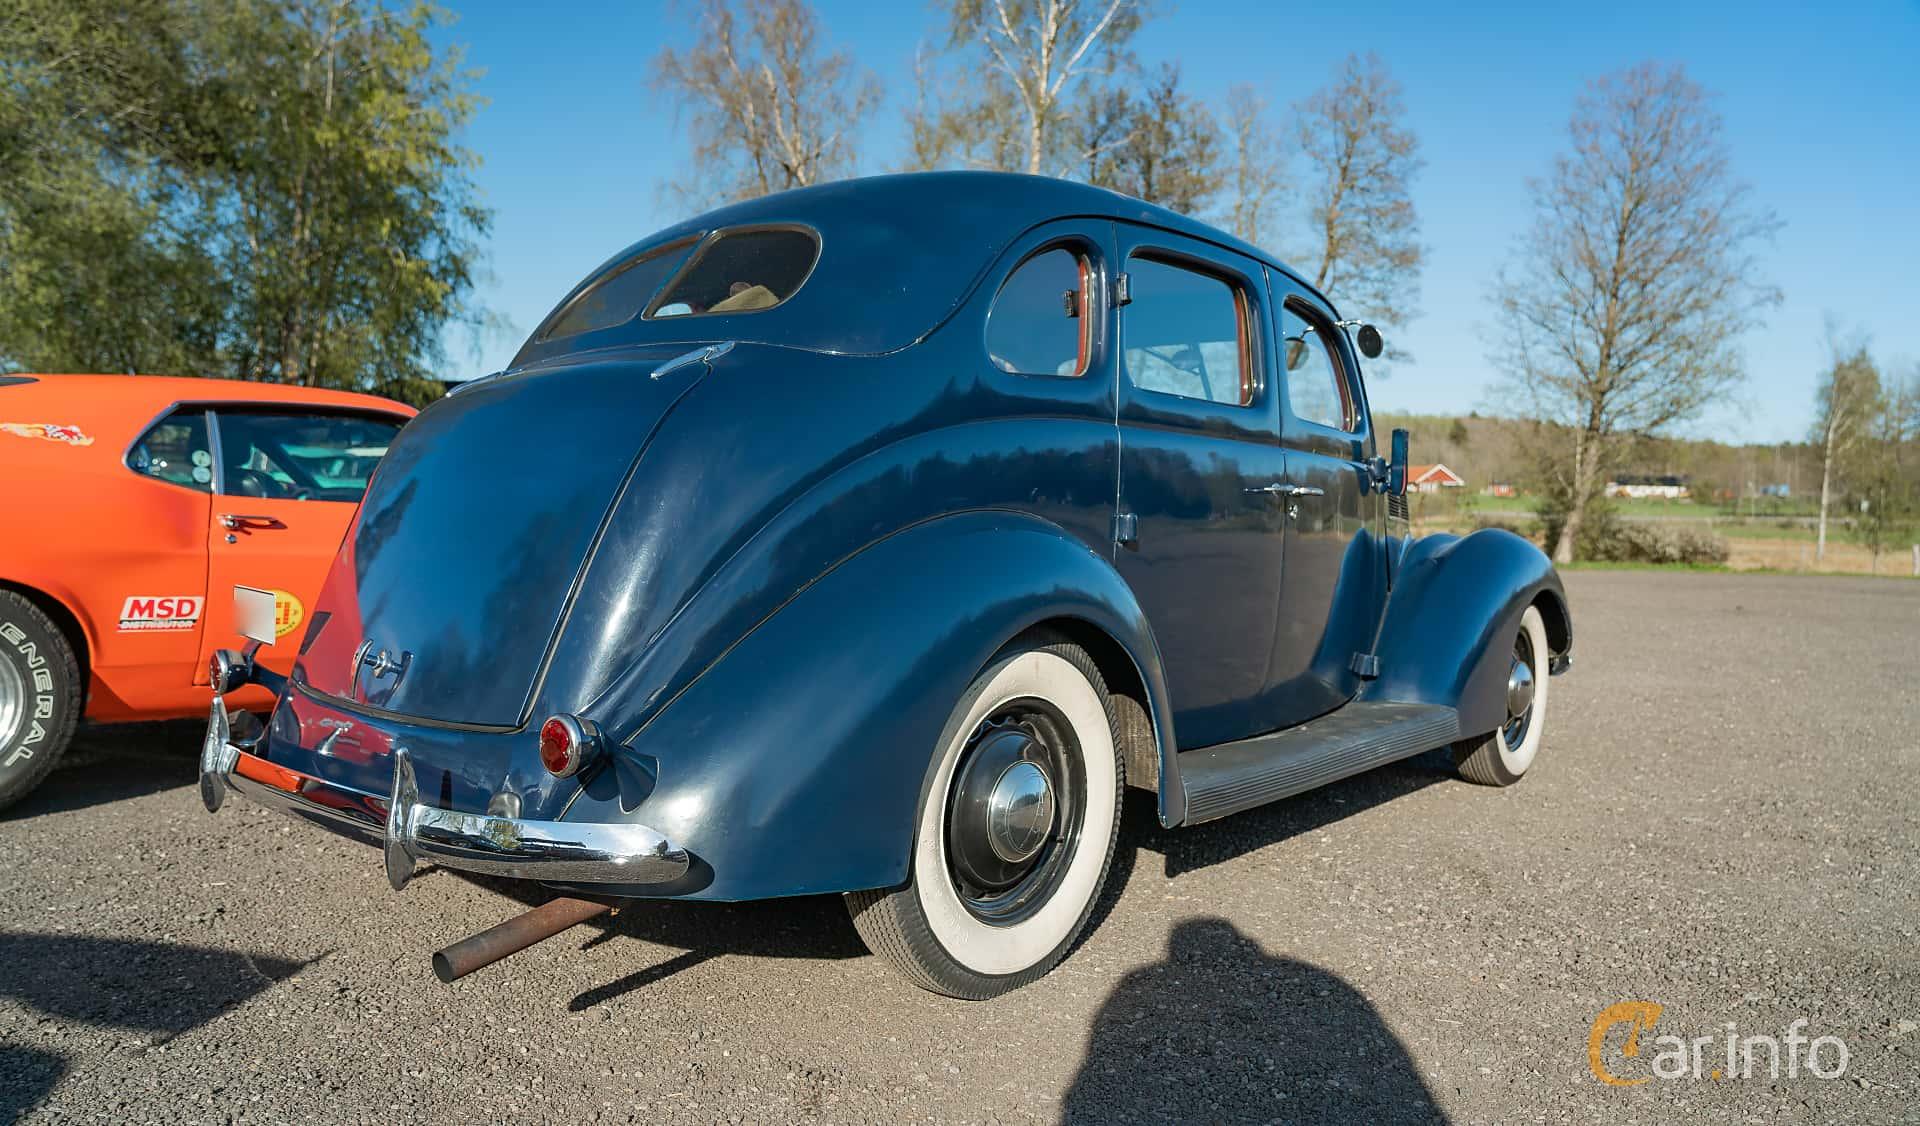 Ford Model 74 Fordor Touring Sedan 2.2 V8 Manual, 61hp, 1937 at Lissma Classic Car 2019 vecka 20